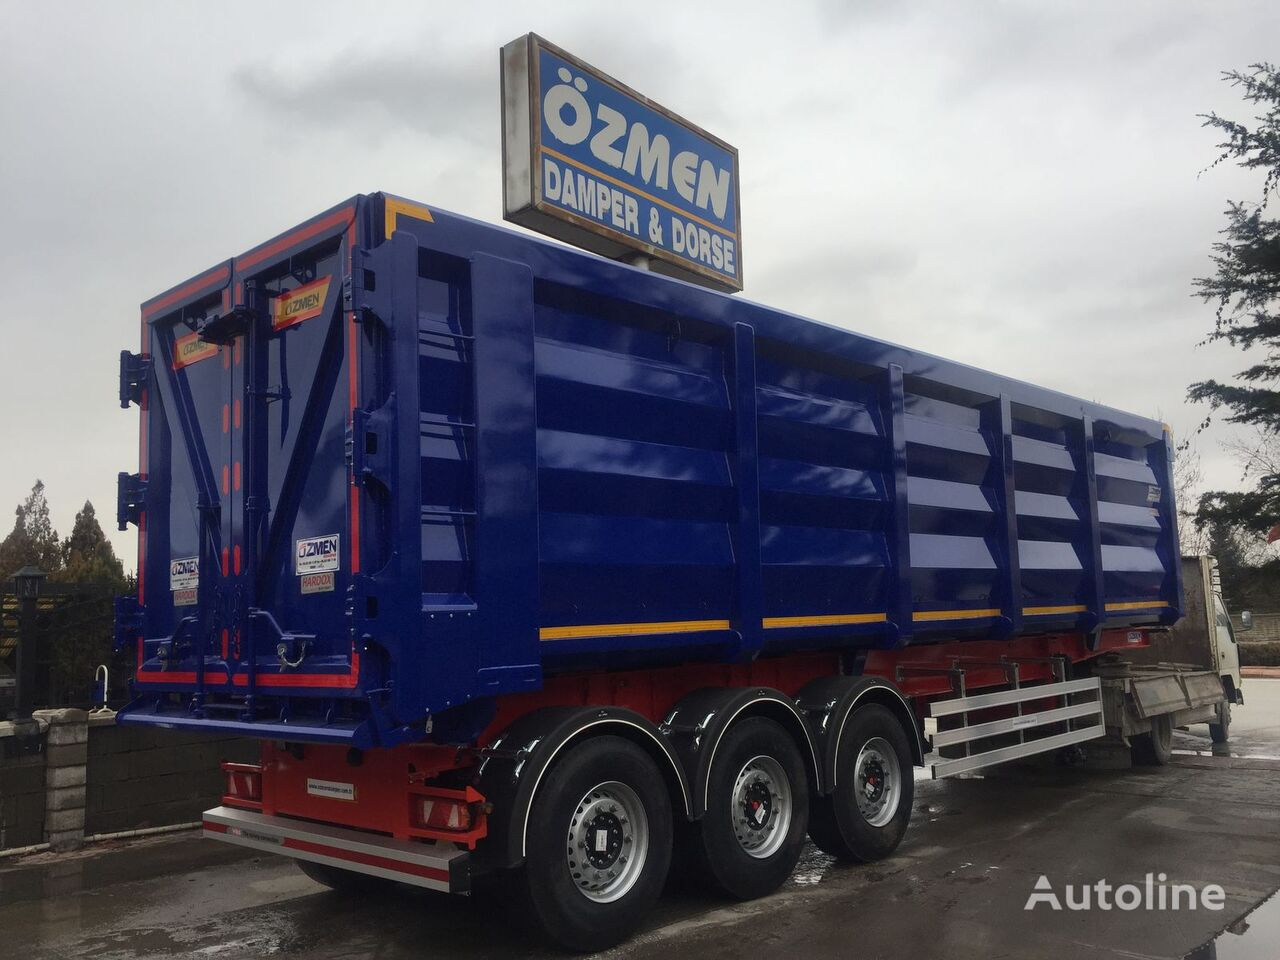 new Ozmen Damper 55 m3 SCRAP METAL  CARRIER grain truck semi-trailer